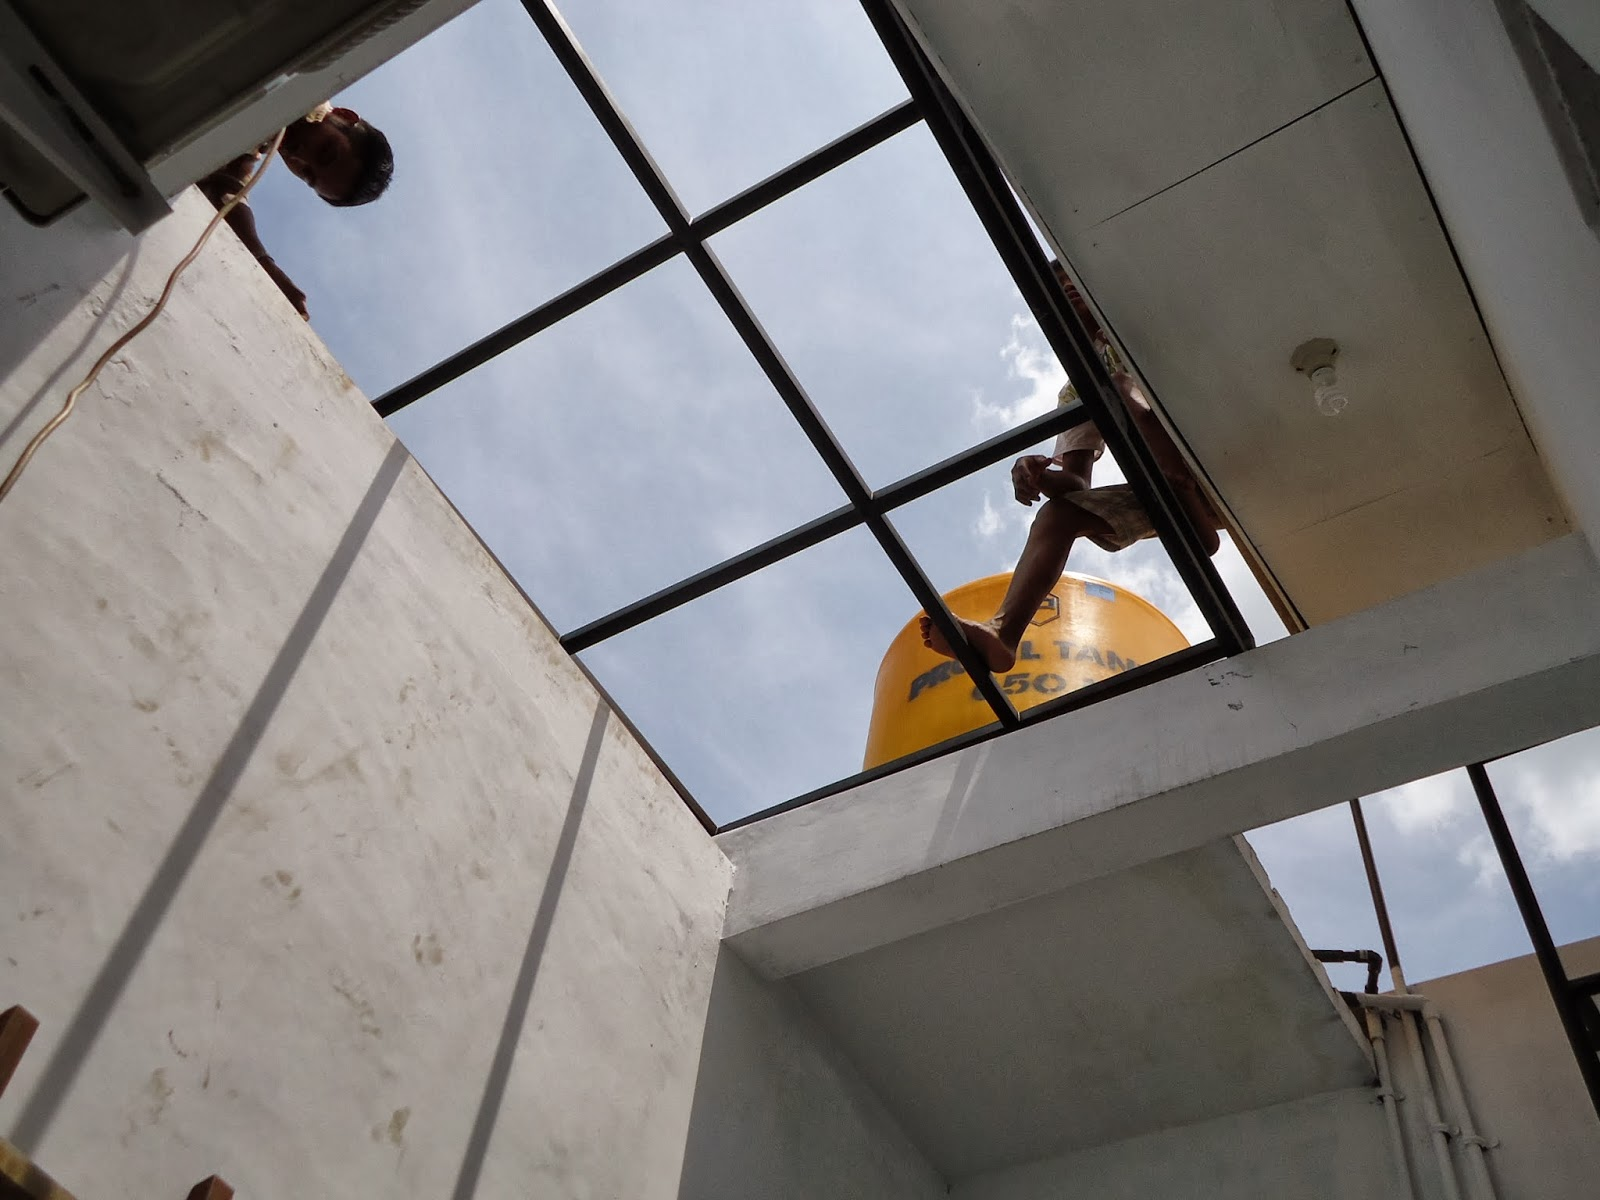 jasa borong bangunan dan renovasi rumah semarang foto